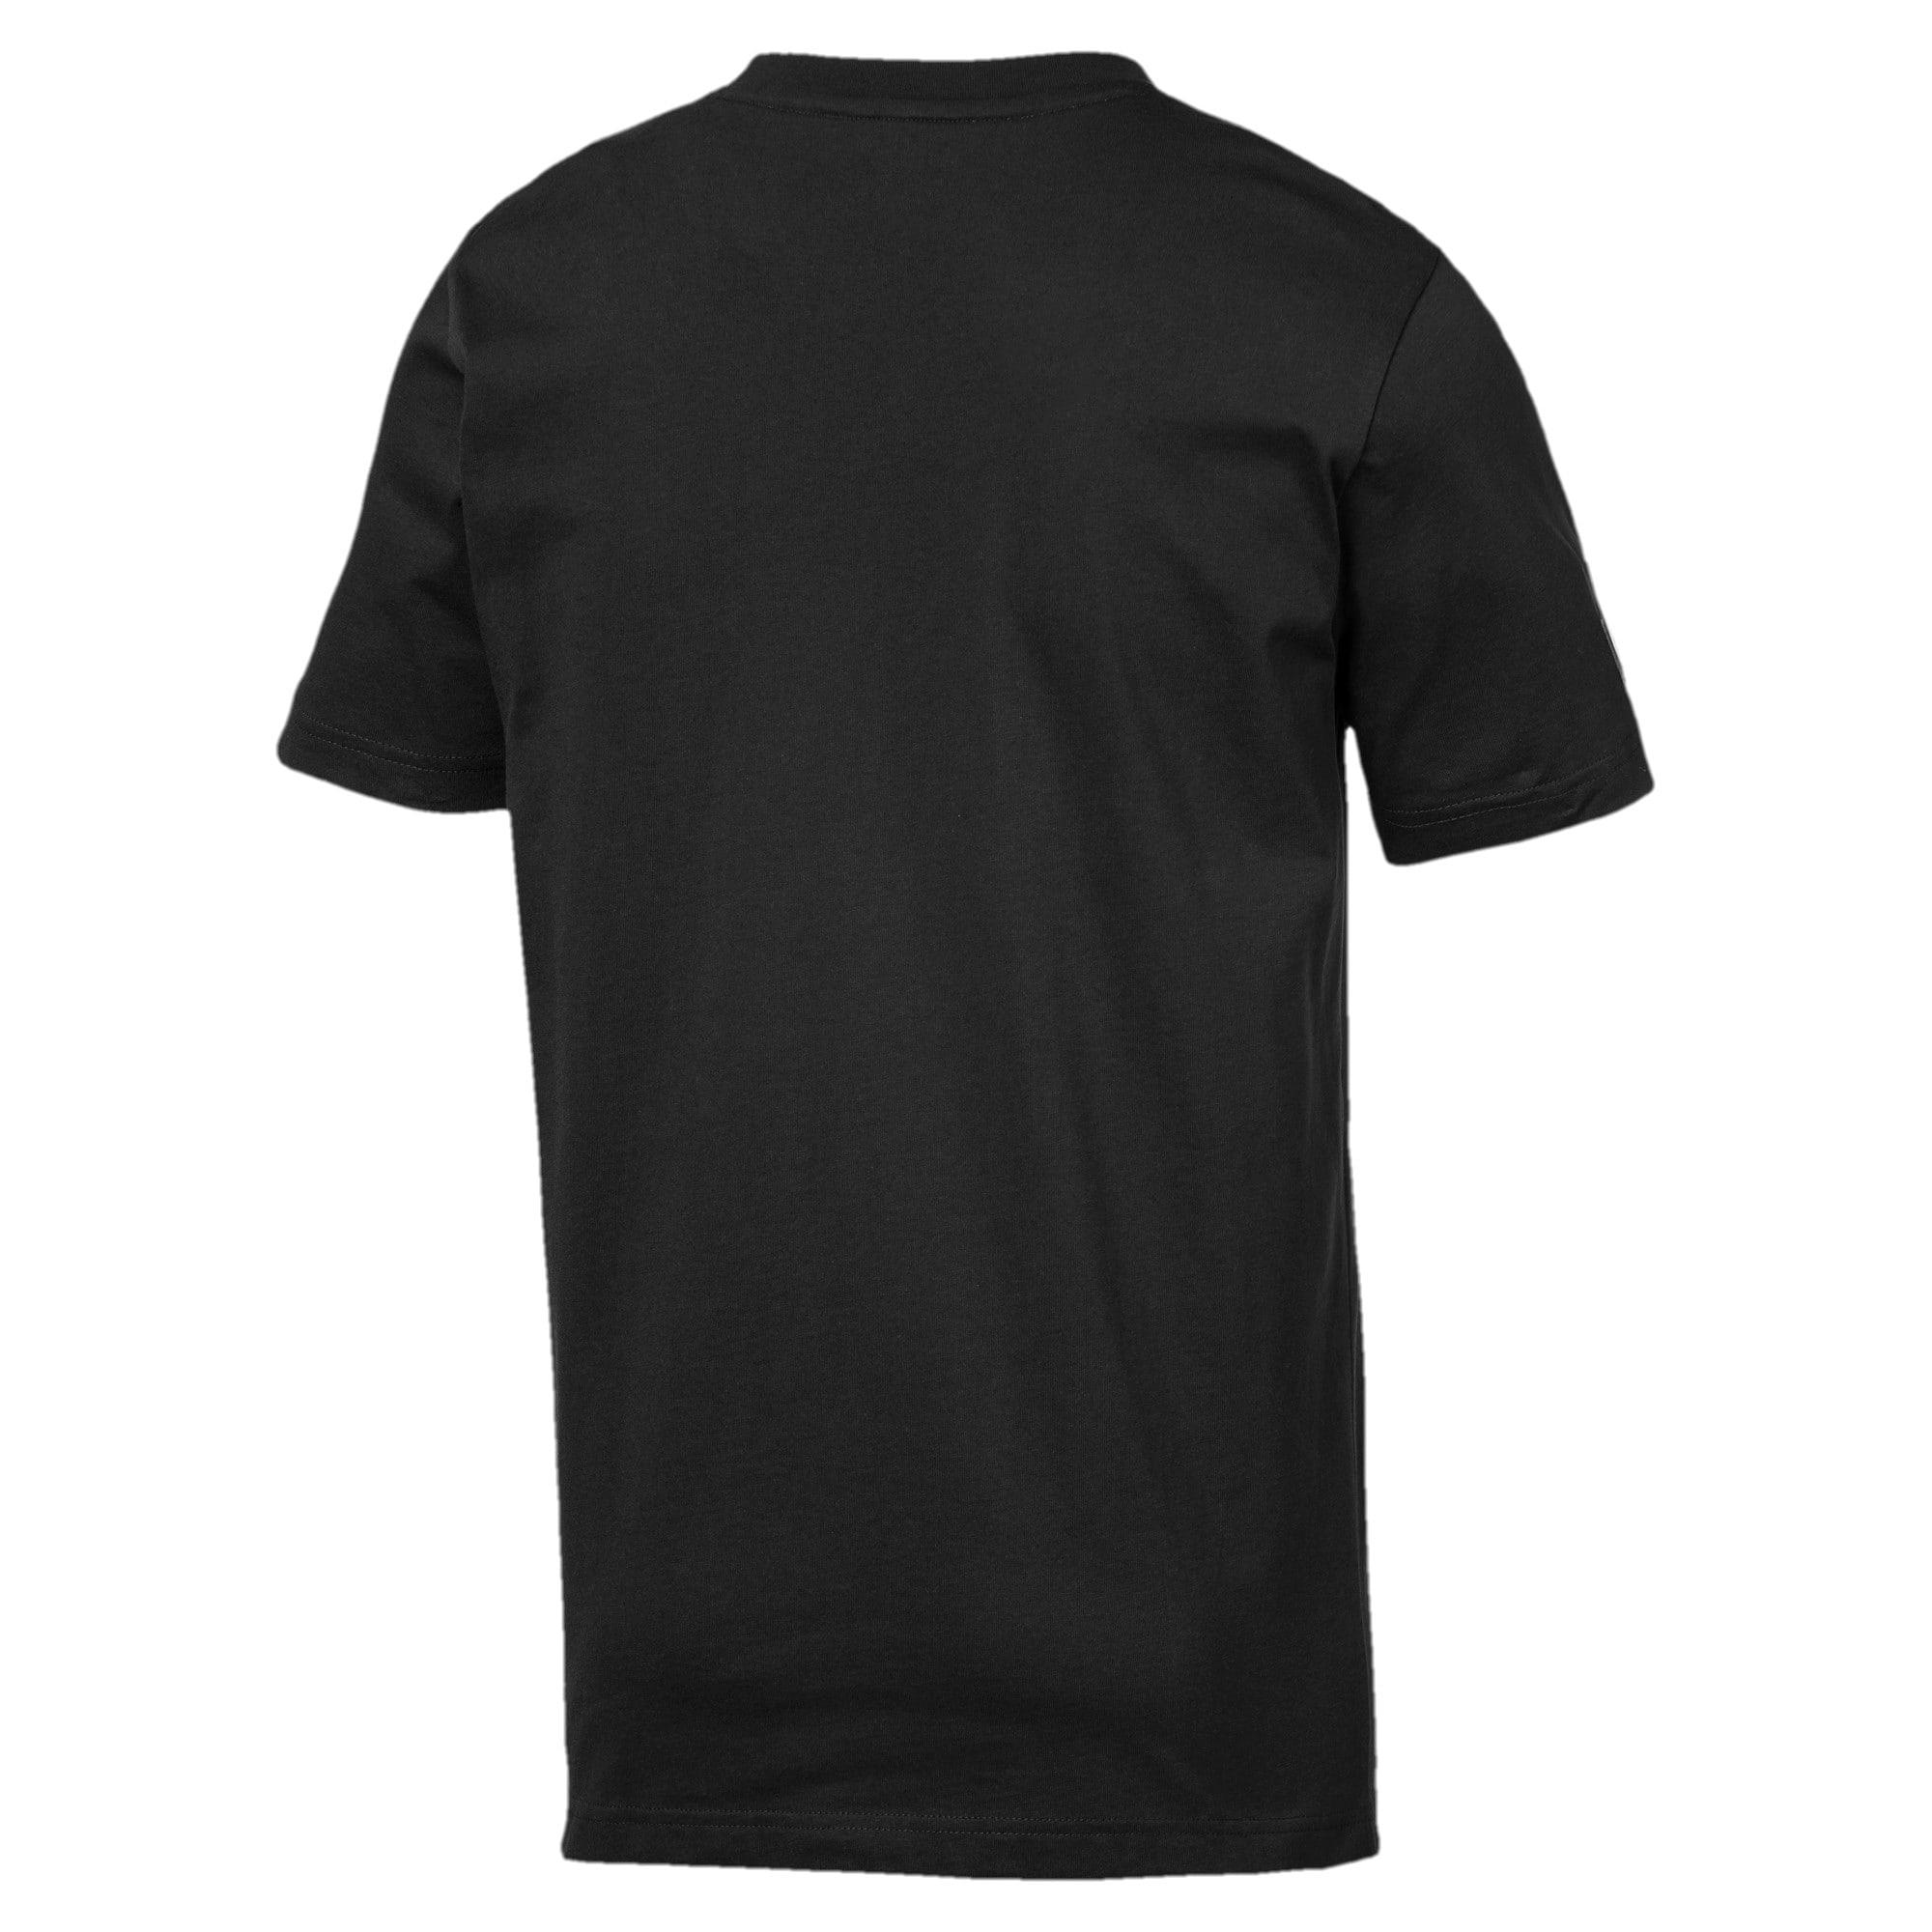 Thumbnail 5 of T-shirt con stampa Mercedes AMG Petronas uomo, Puma Black, medium